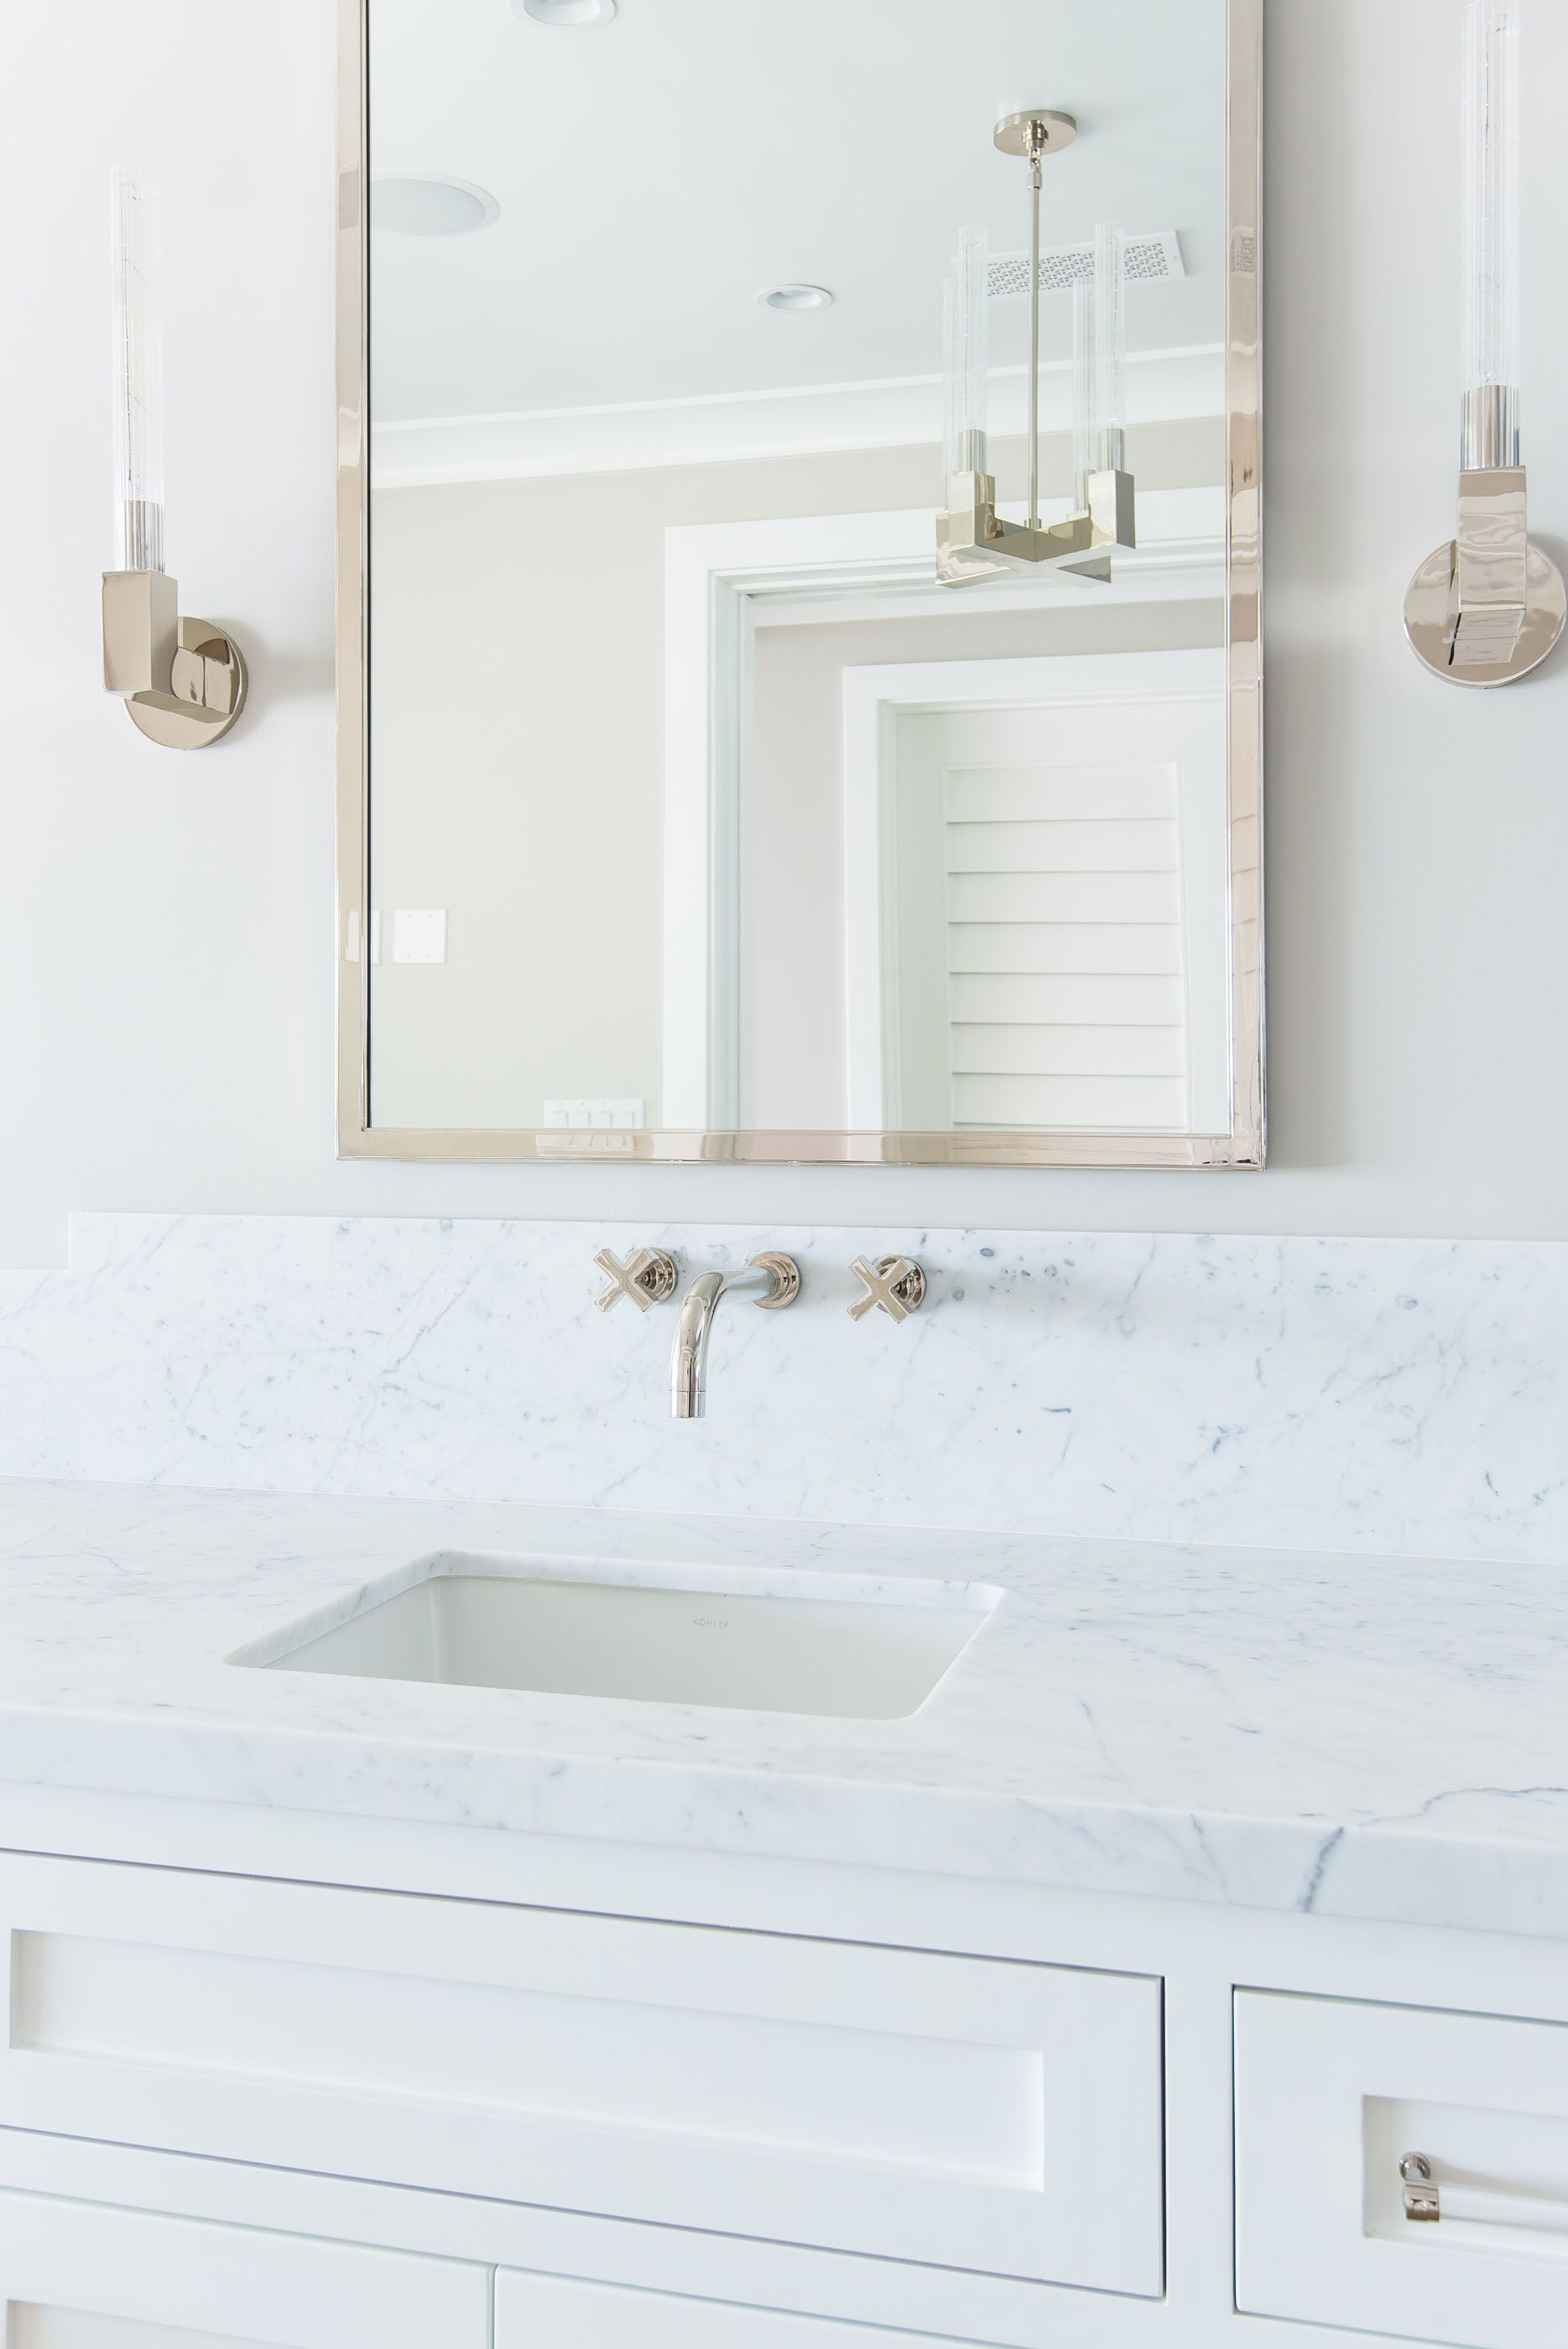 Marble Vanity + wall mounted faucet | Melissa Morgan Design ...